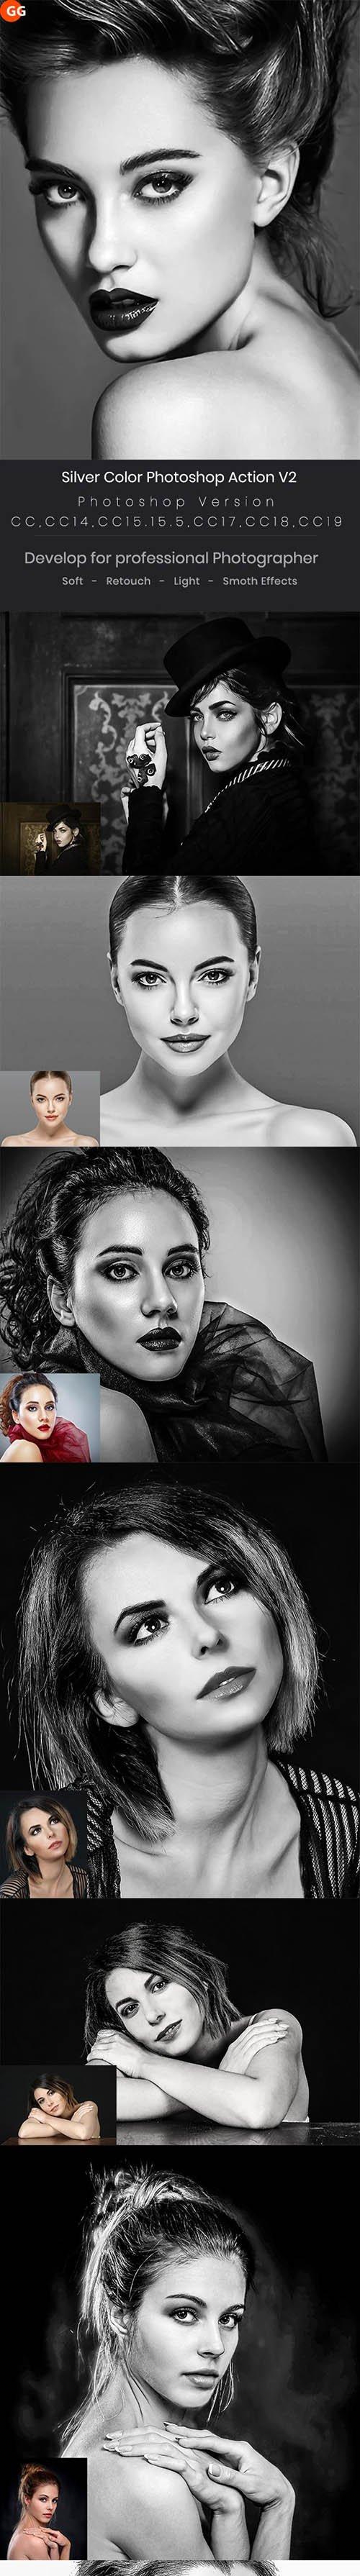 Silver Color Photoshop Action V2 24884124